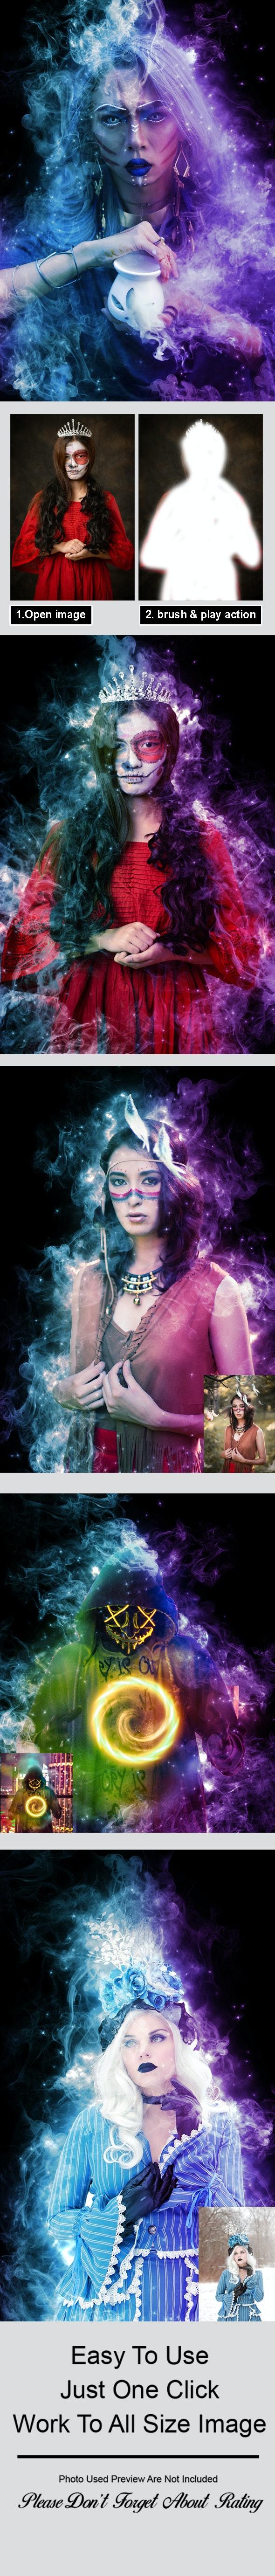 Magic Dust Photoshop Action - Actions Photoshop